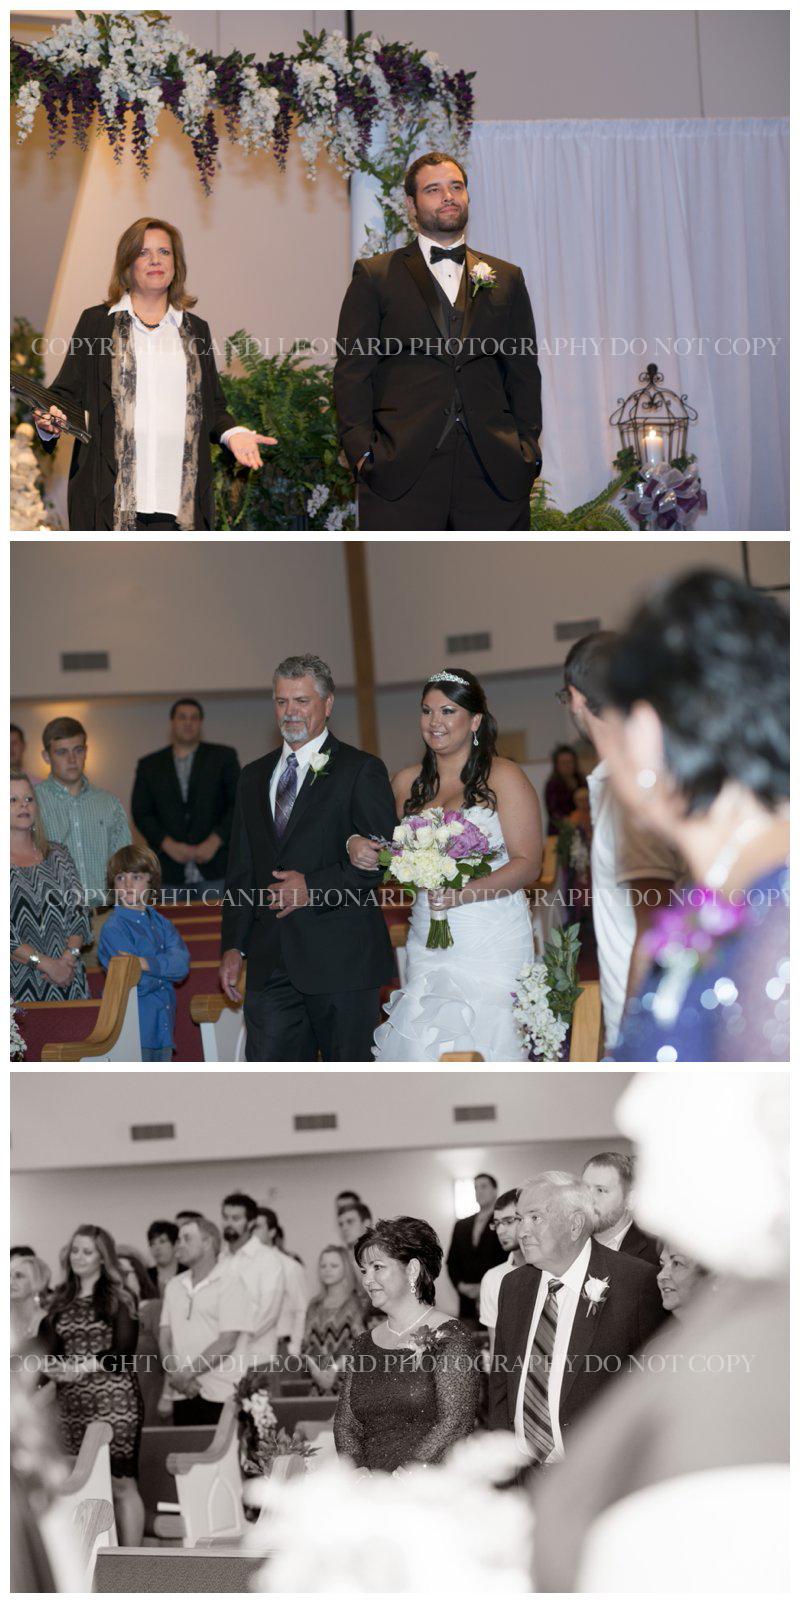 Black_lake_wedding_asheboro_NC__0405